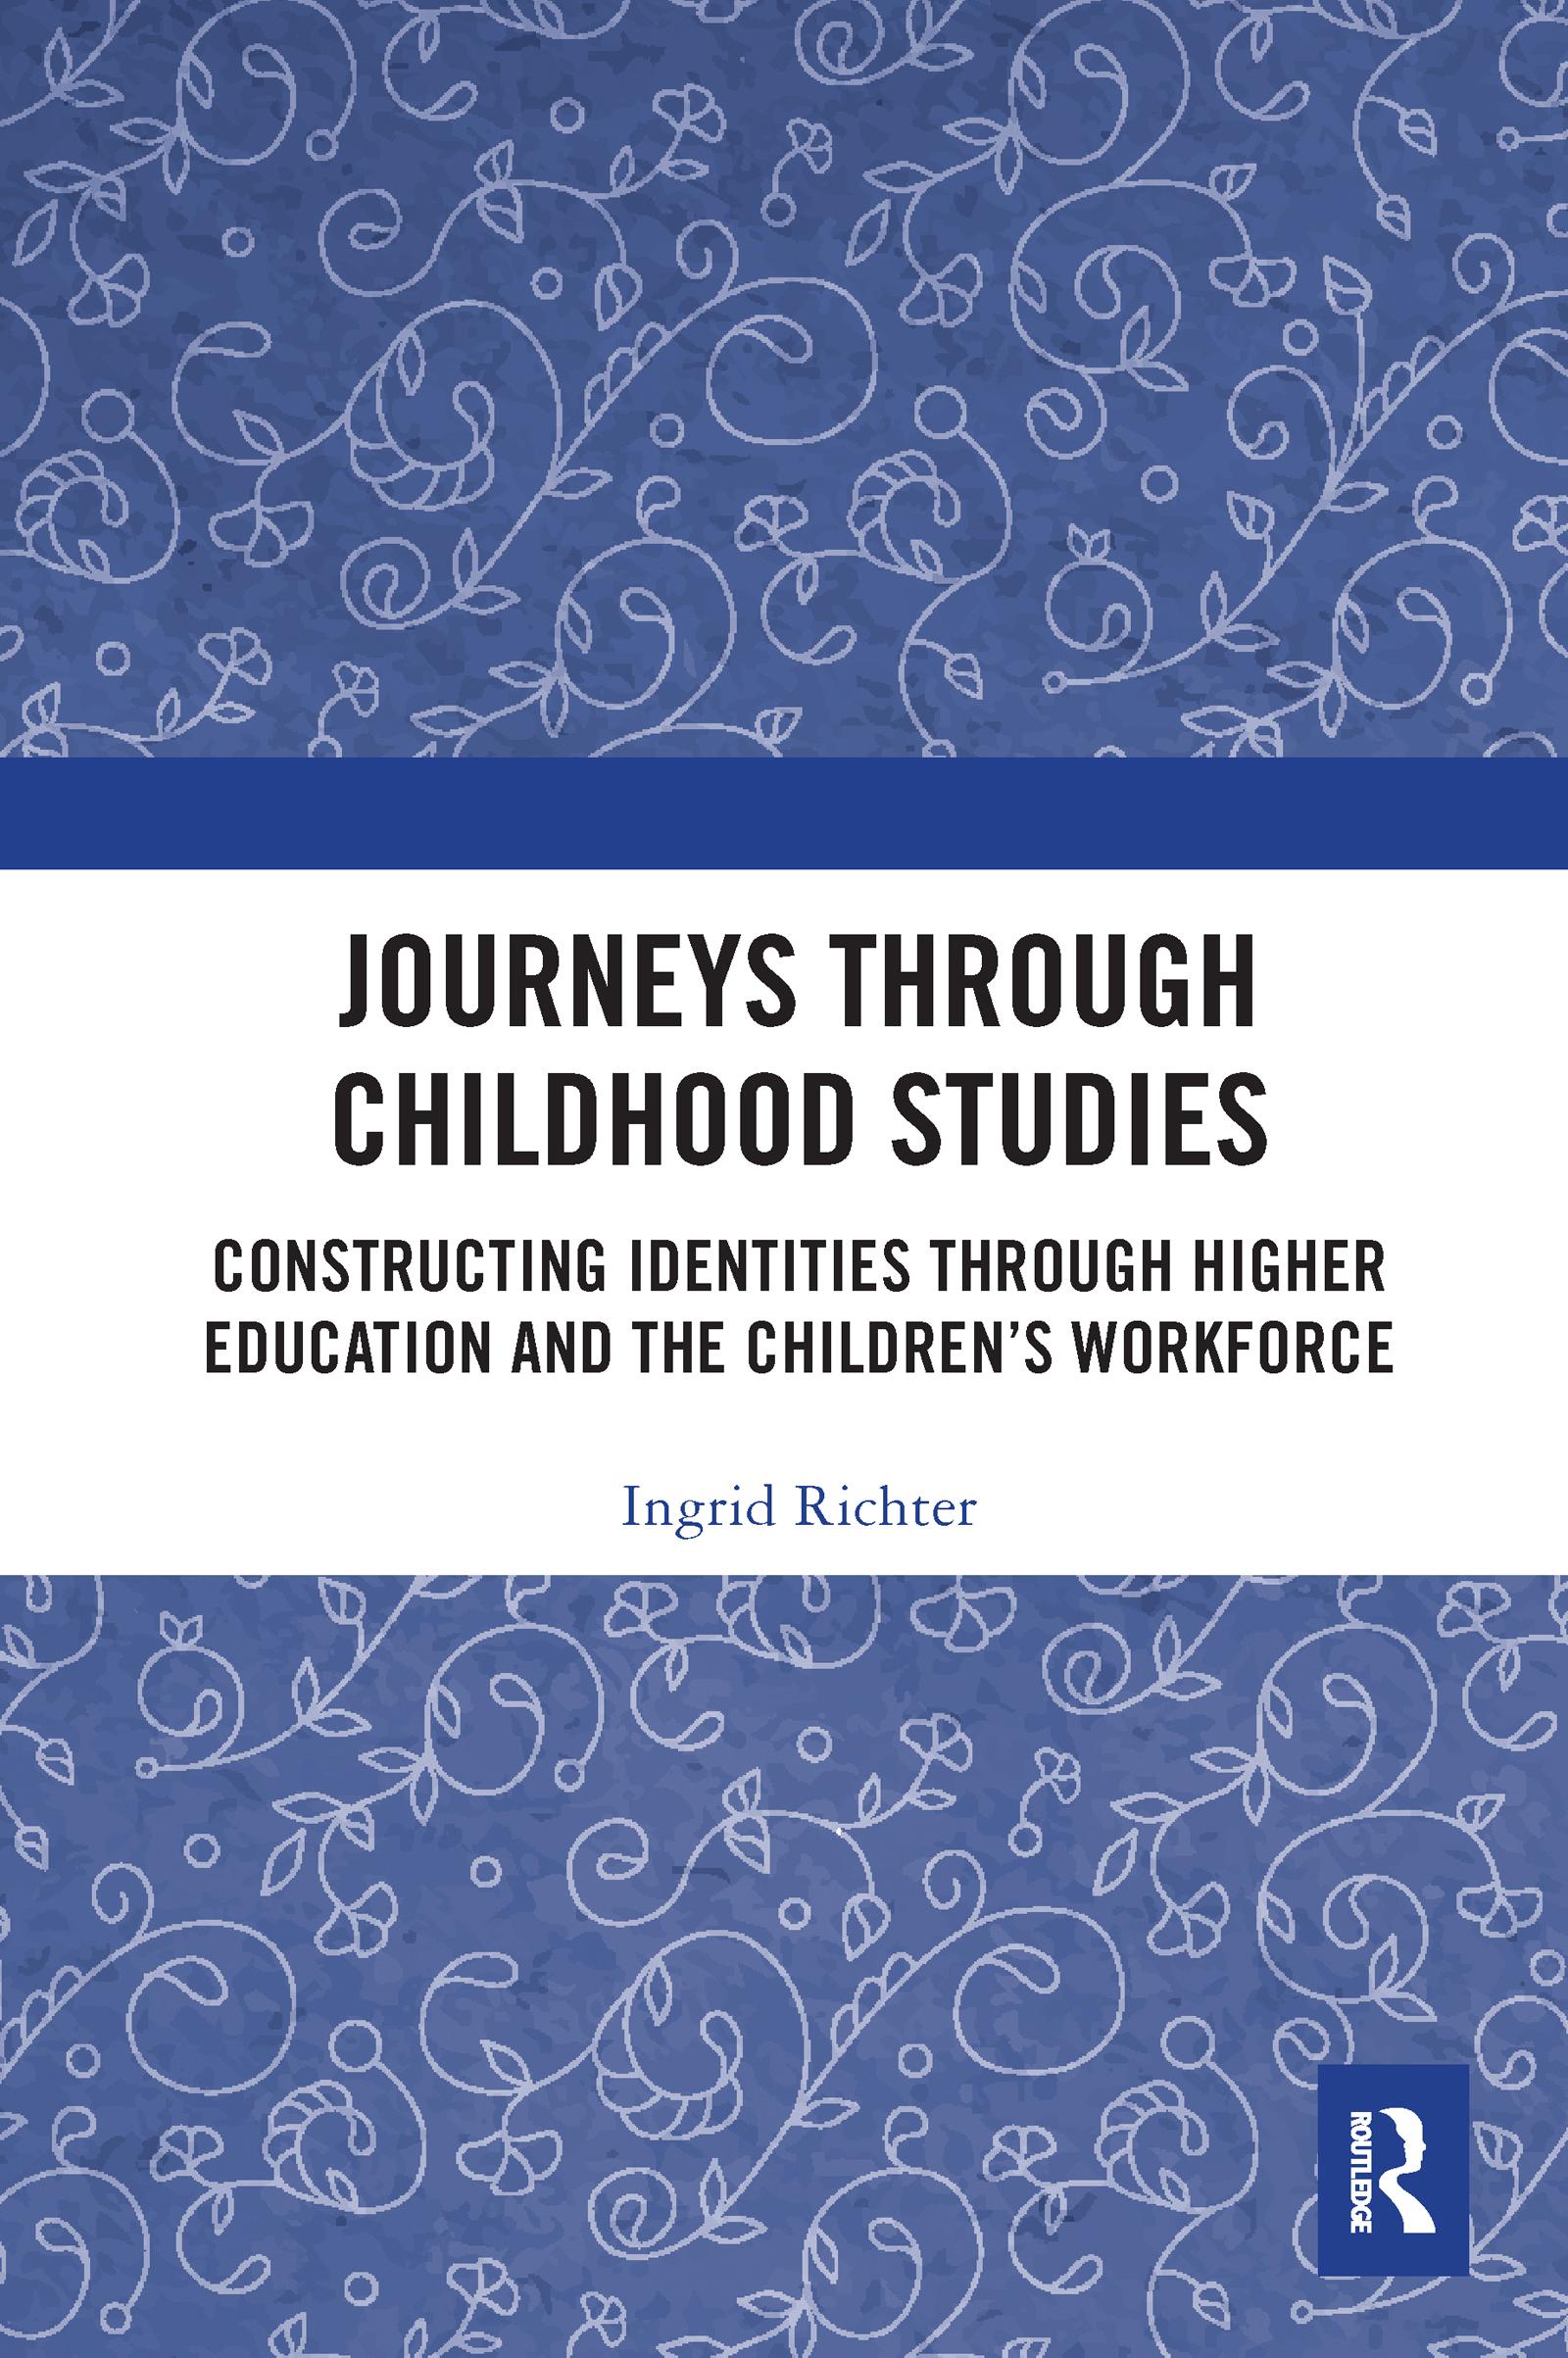 Journeys through Childhood Studies